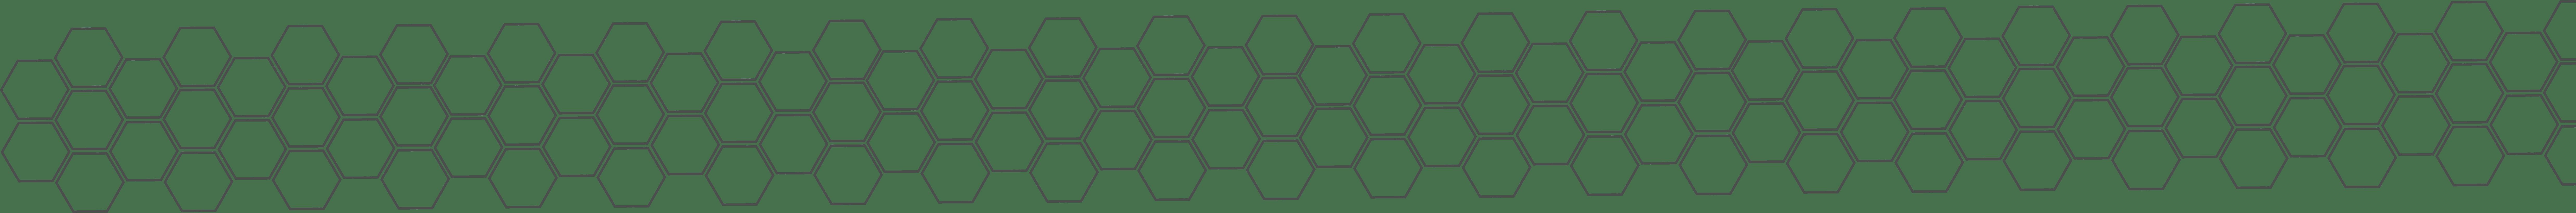 long black honey comb graphic